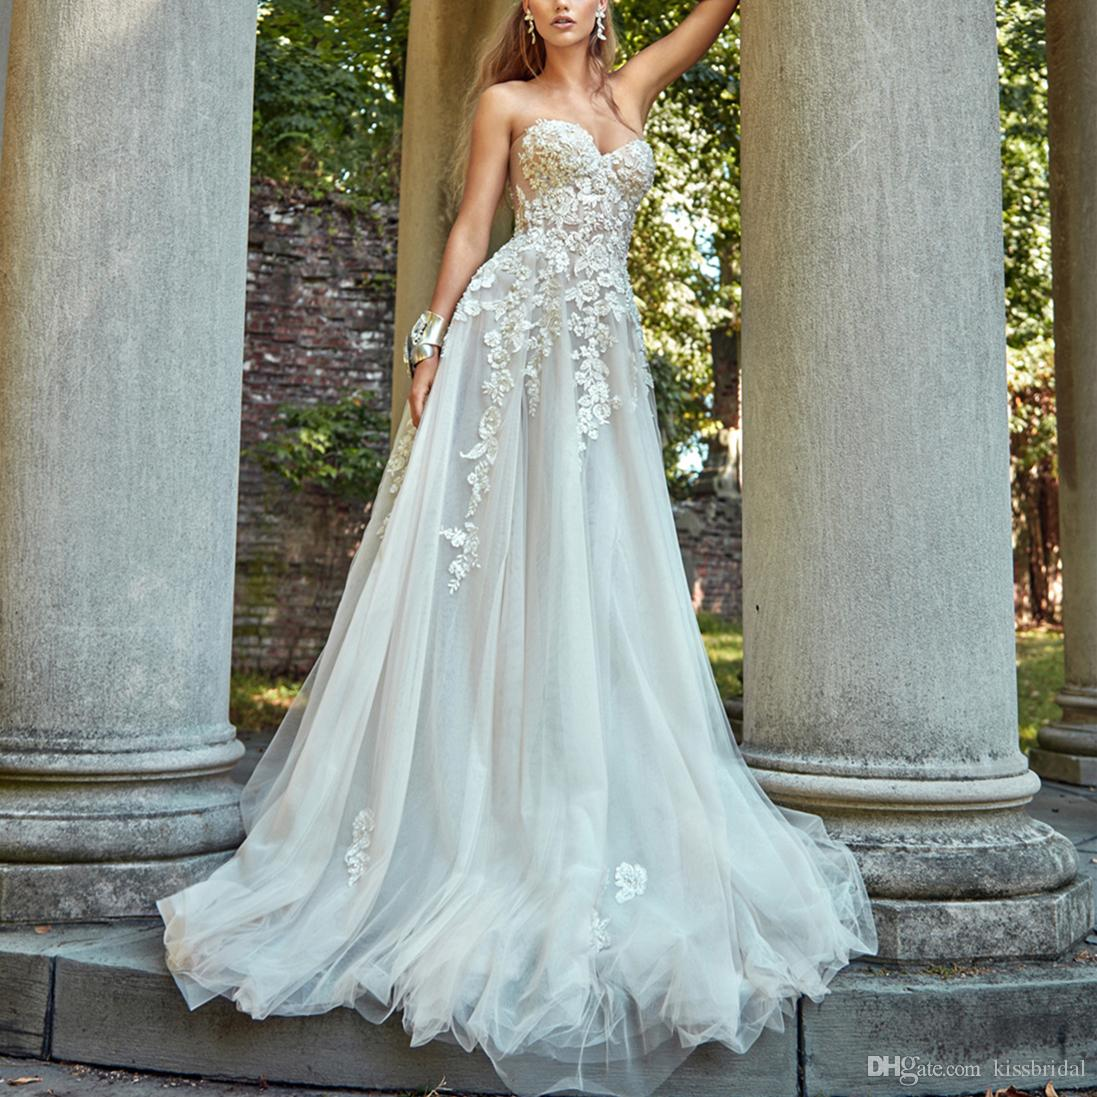 04c83b974 Discount 2019 Wedding Dresses Vestido De Novia Strapless Sweetheart  Neckline Beaded 3D Lace Wedding Dress Bridal Gowns Bohemian Wedding Gown V  Neck A Line ...